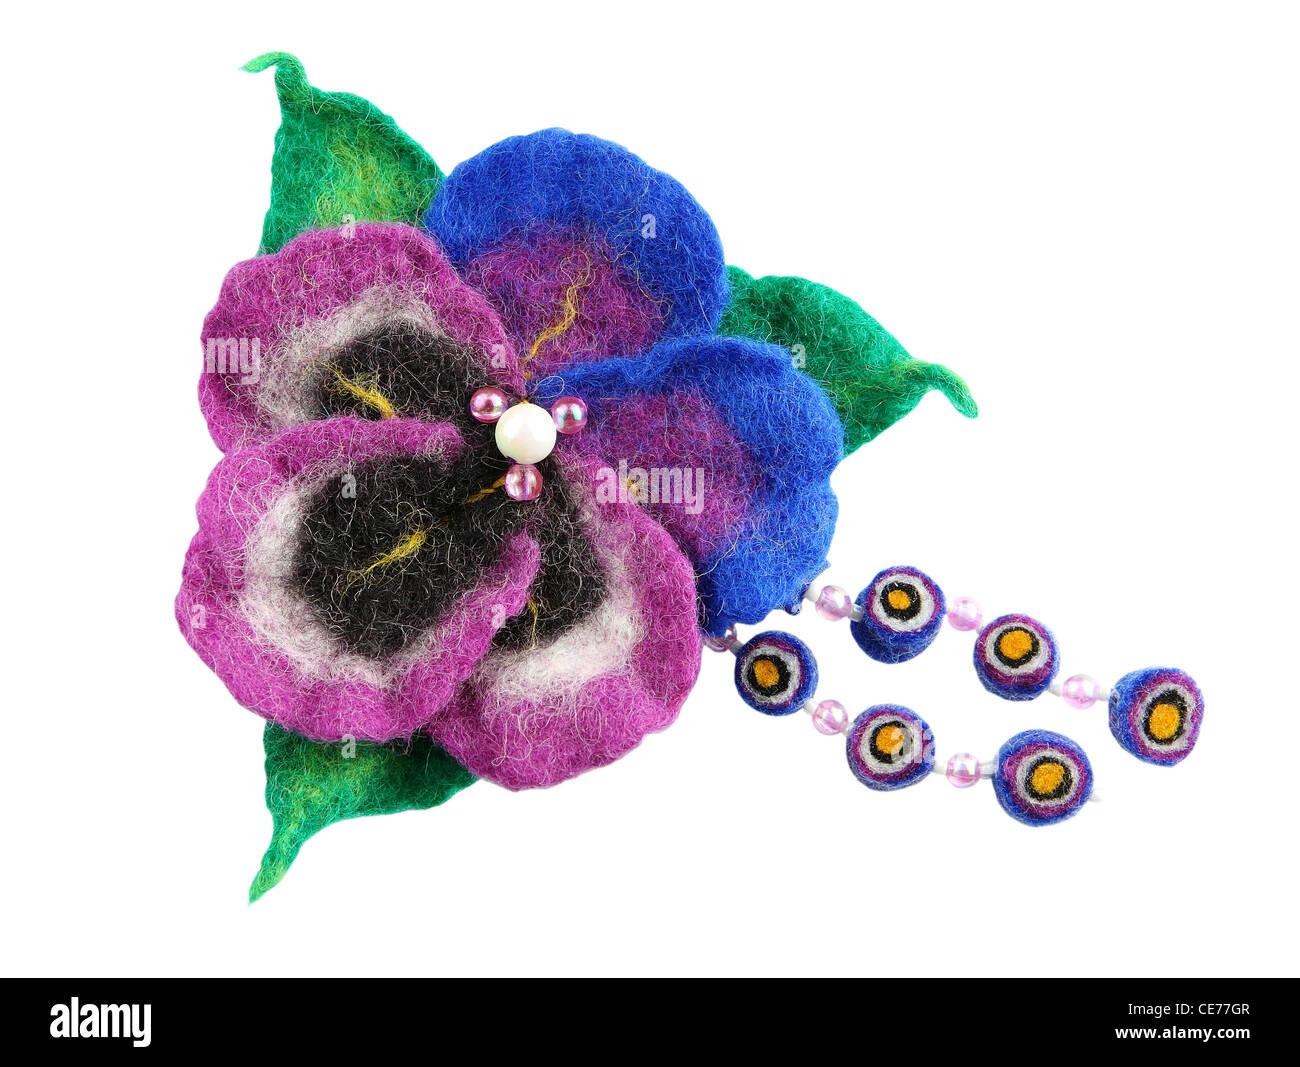 Felt of natural wool brooch. Viola - Stock Image